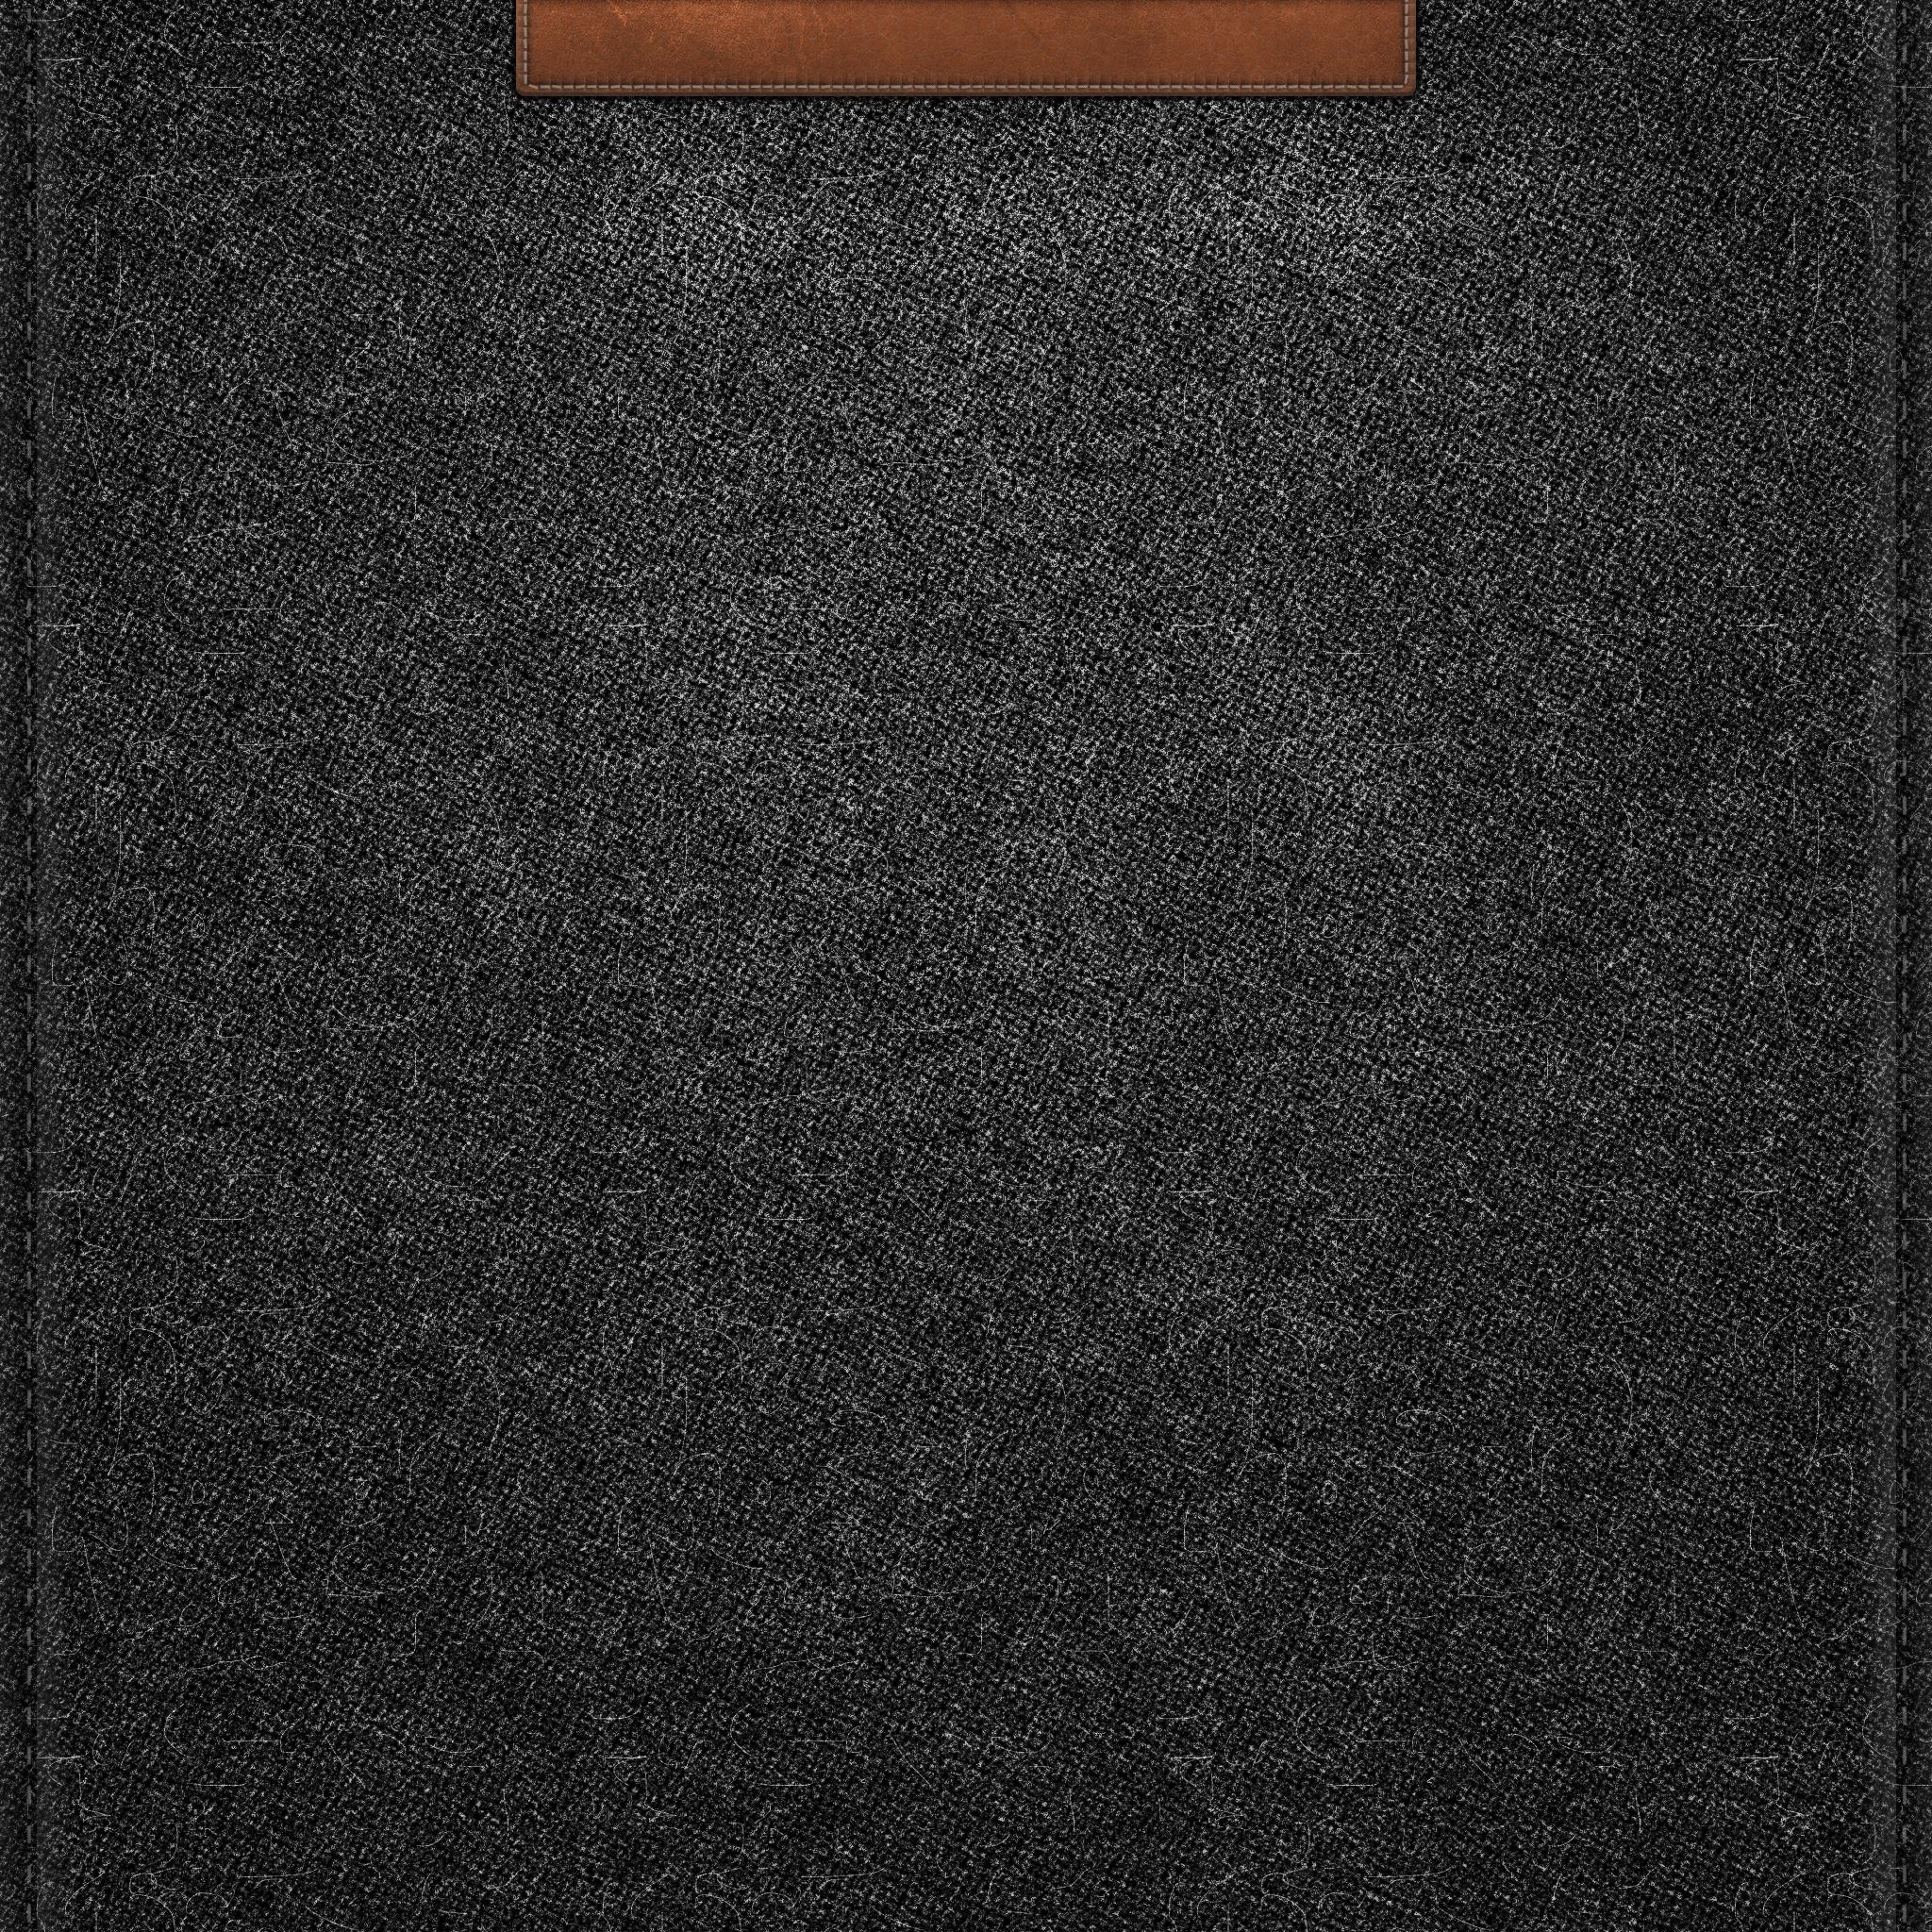 iPad皮革壁纸